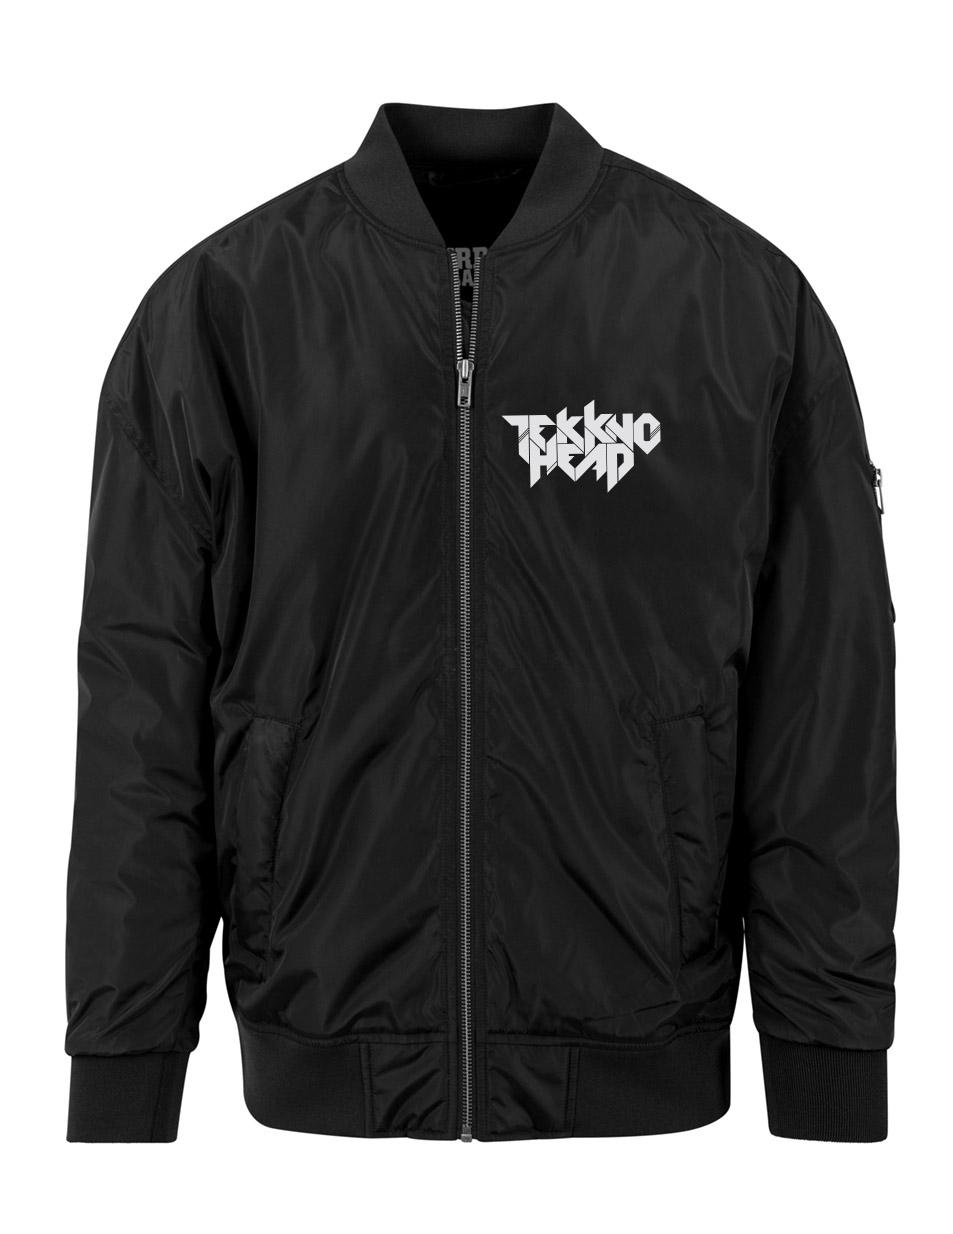 TEKKNOHEAD Overzised Bomber Jacket mehrfarbig auf schwarz